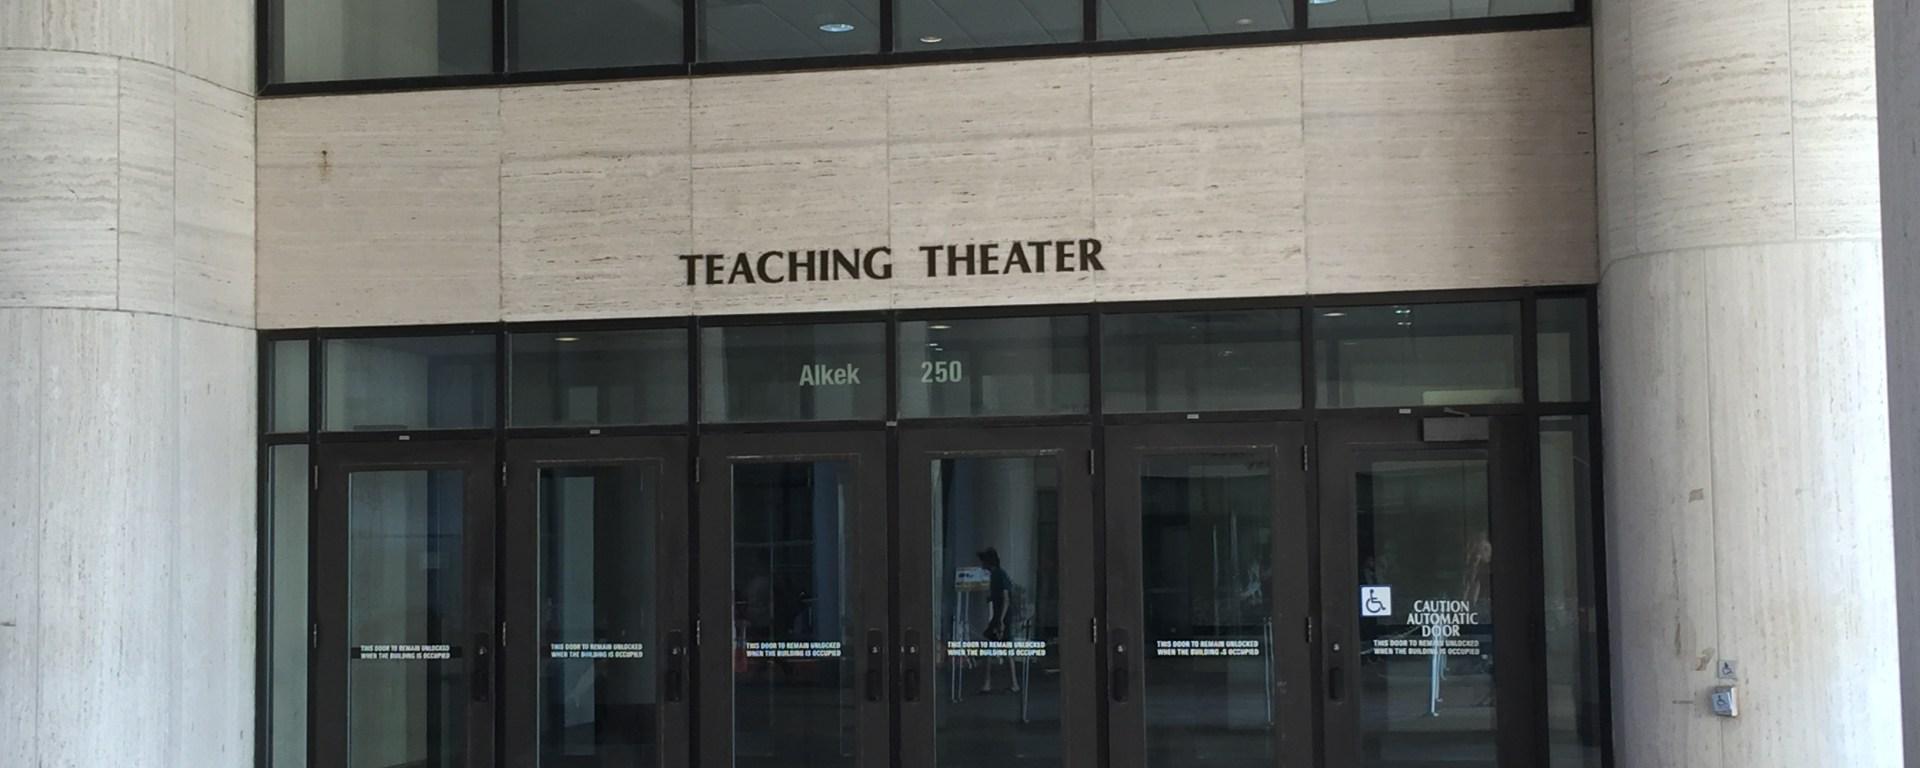 Alkek Teaching Theater